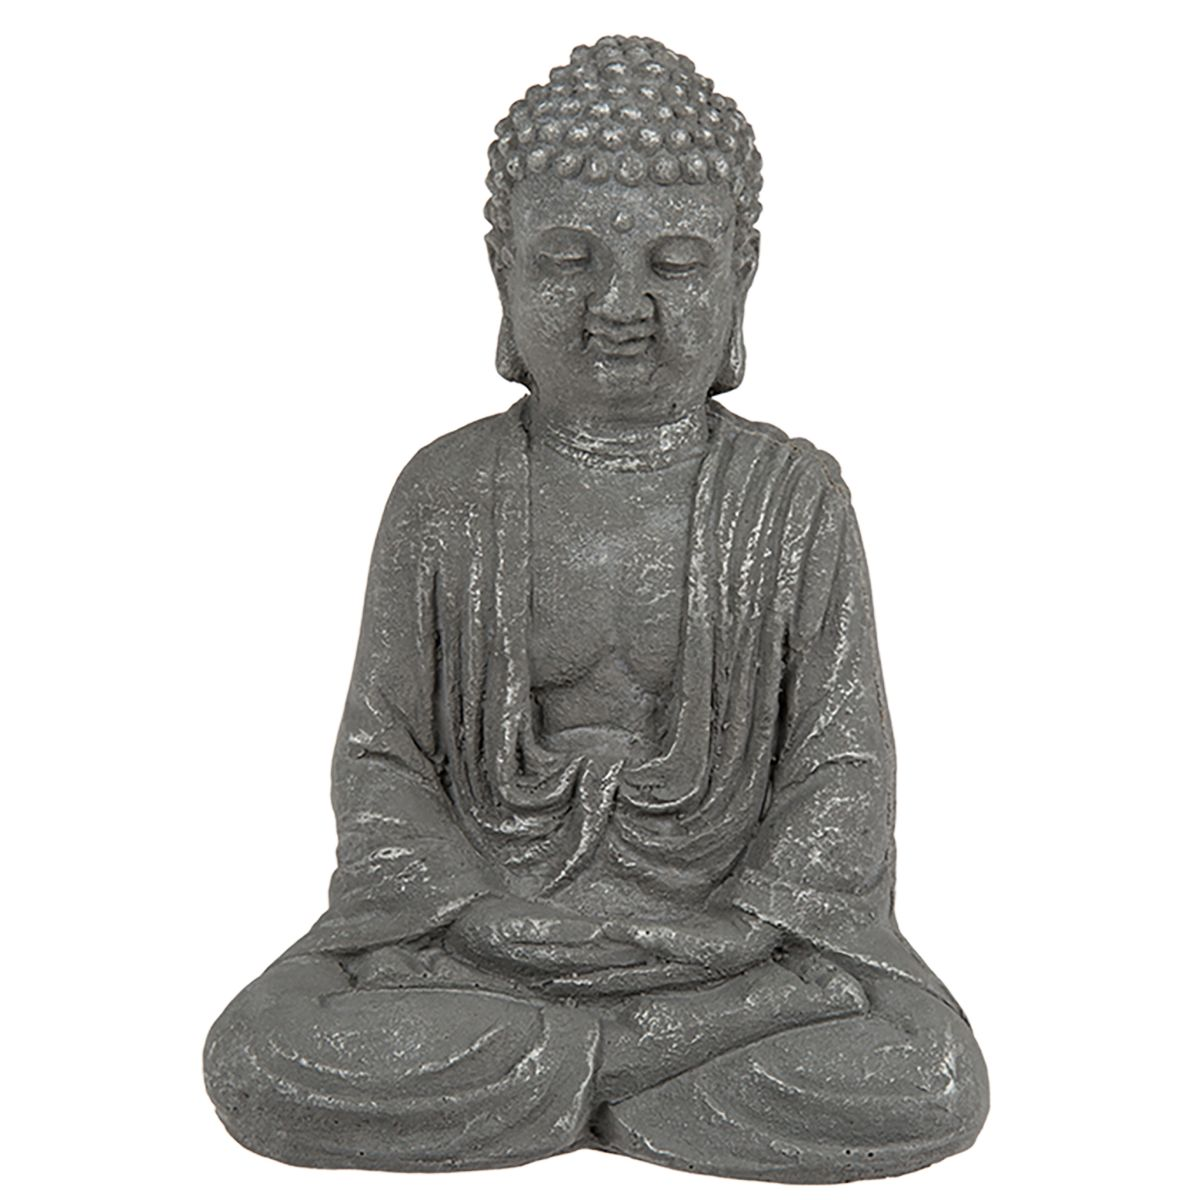 thai buddha dekofigur aus zement 15 5 cm. Black Bedroom Furniture Sets. Home Design Ideas